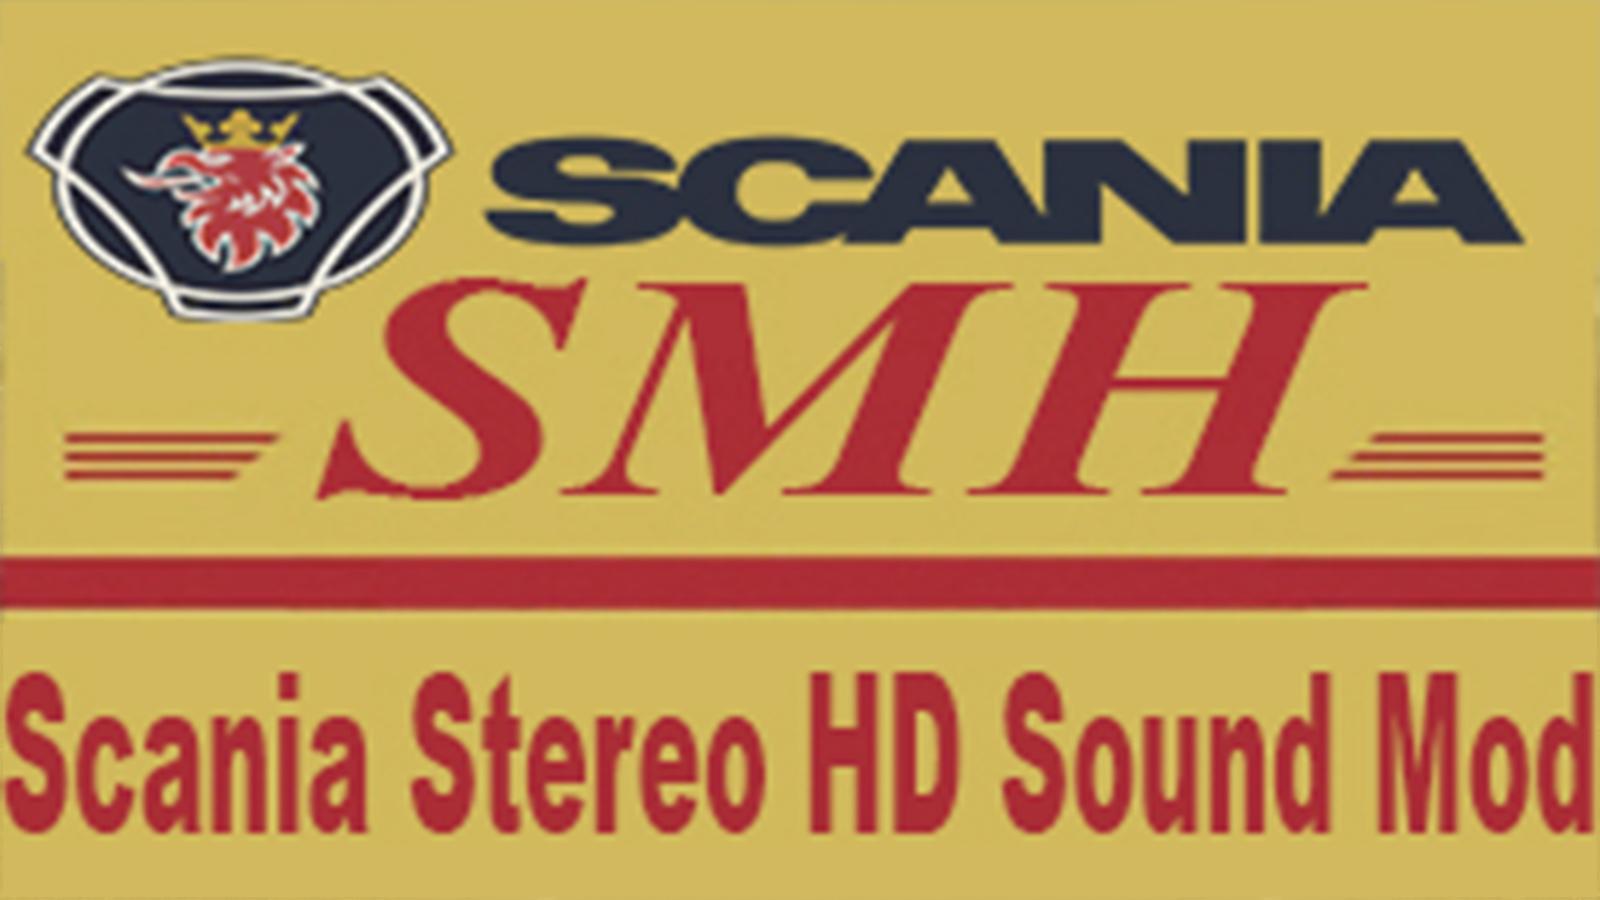 scania-stereo-hd-sound-mod-1-21-x_1